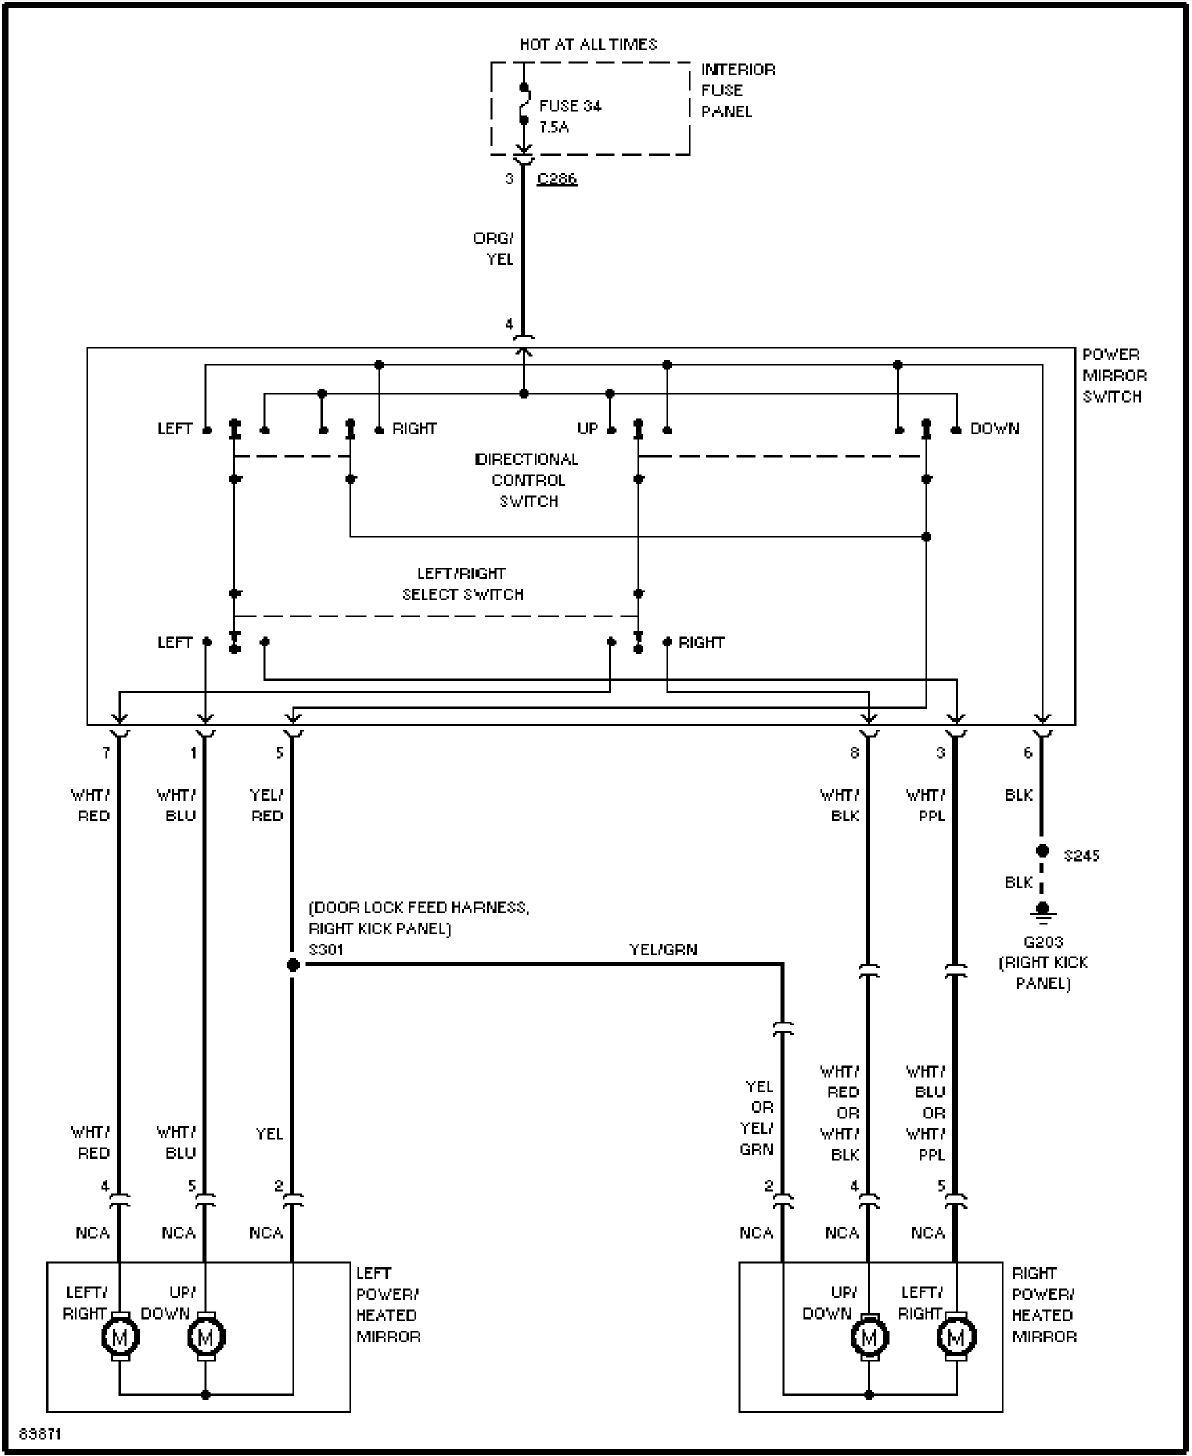 Mazda 626 Wiring Diagram Pdf